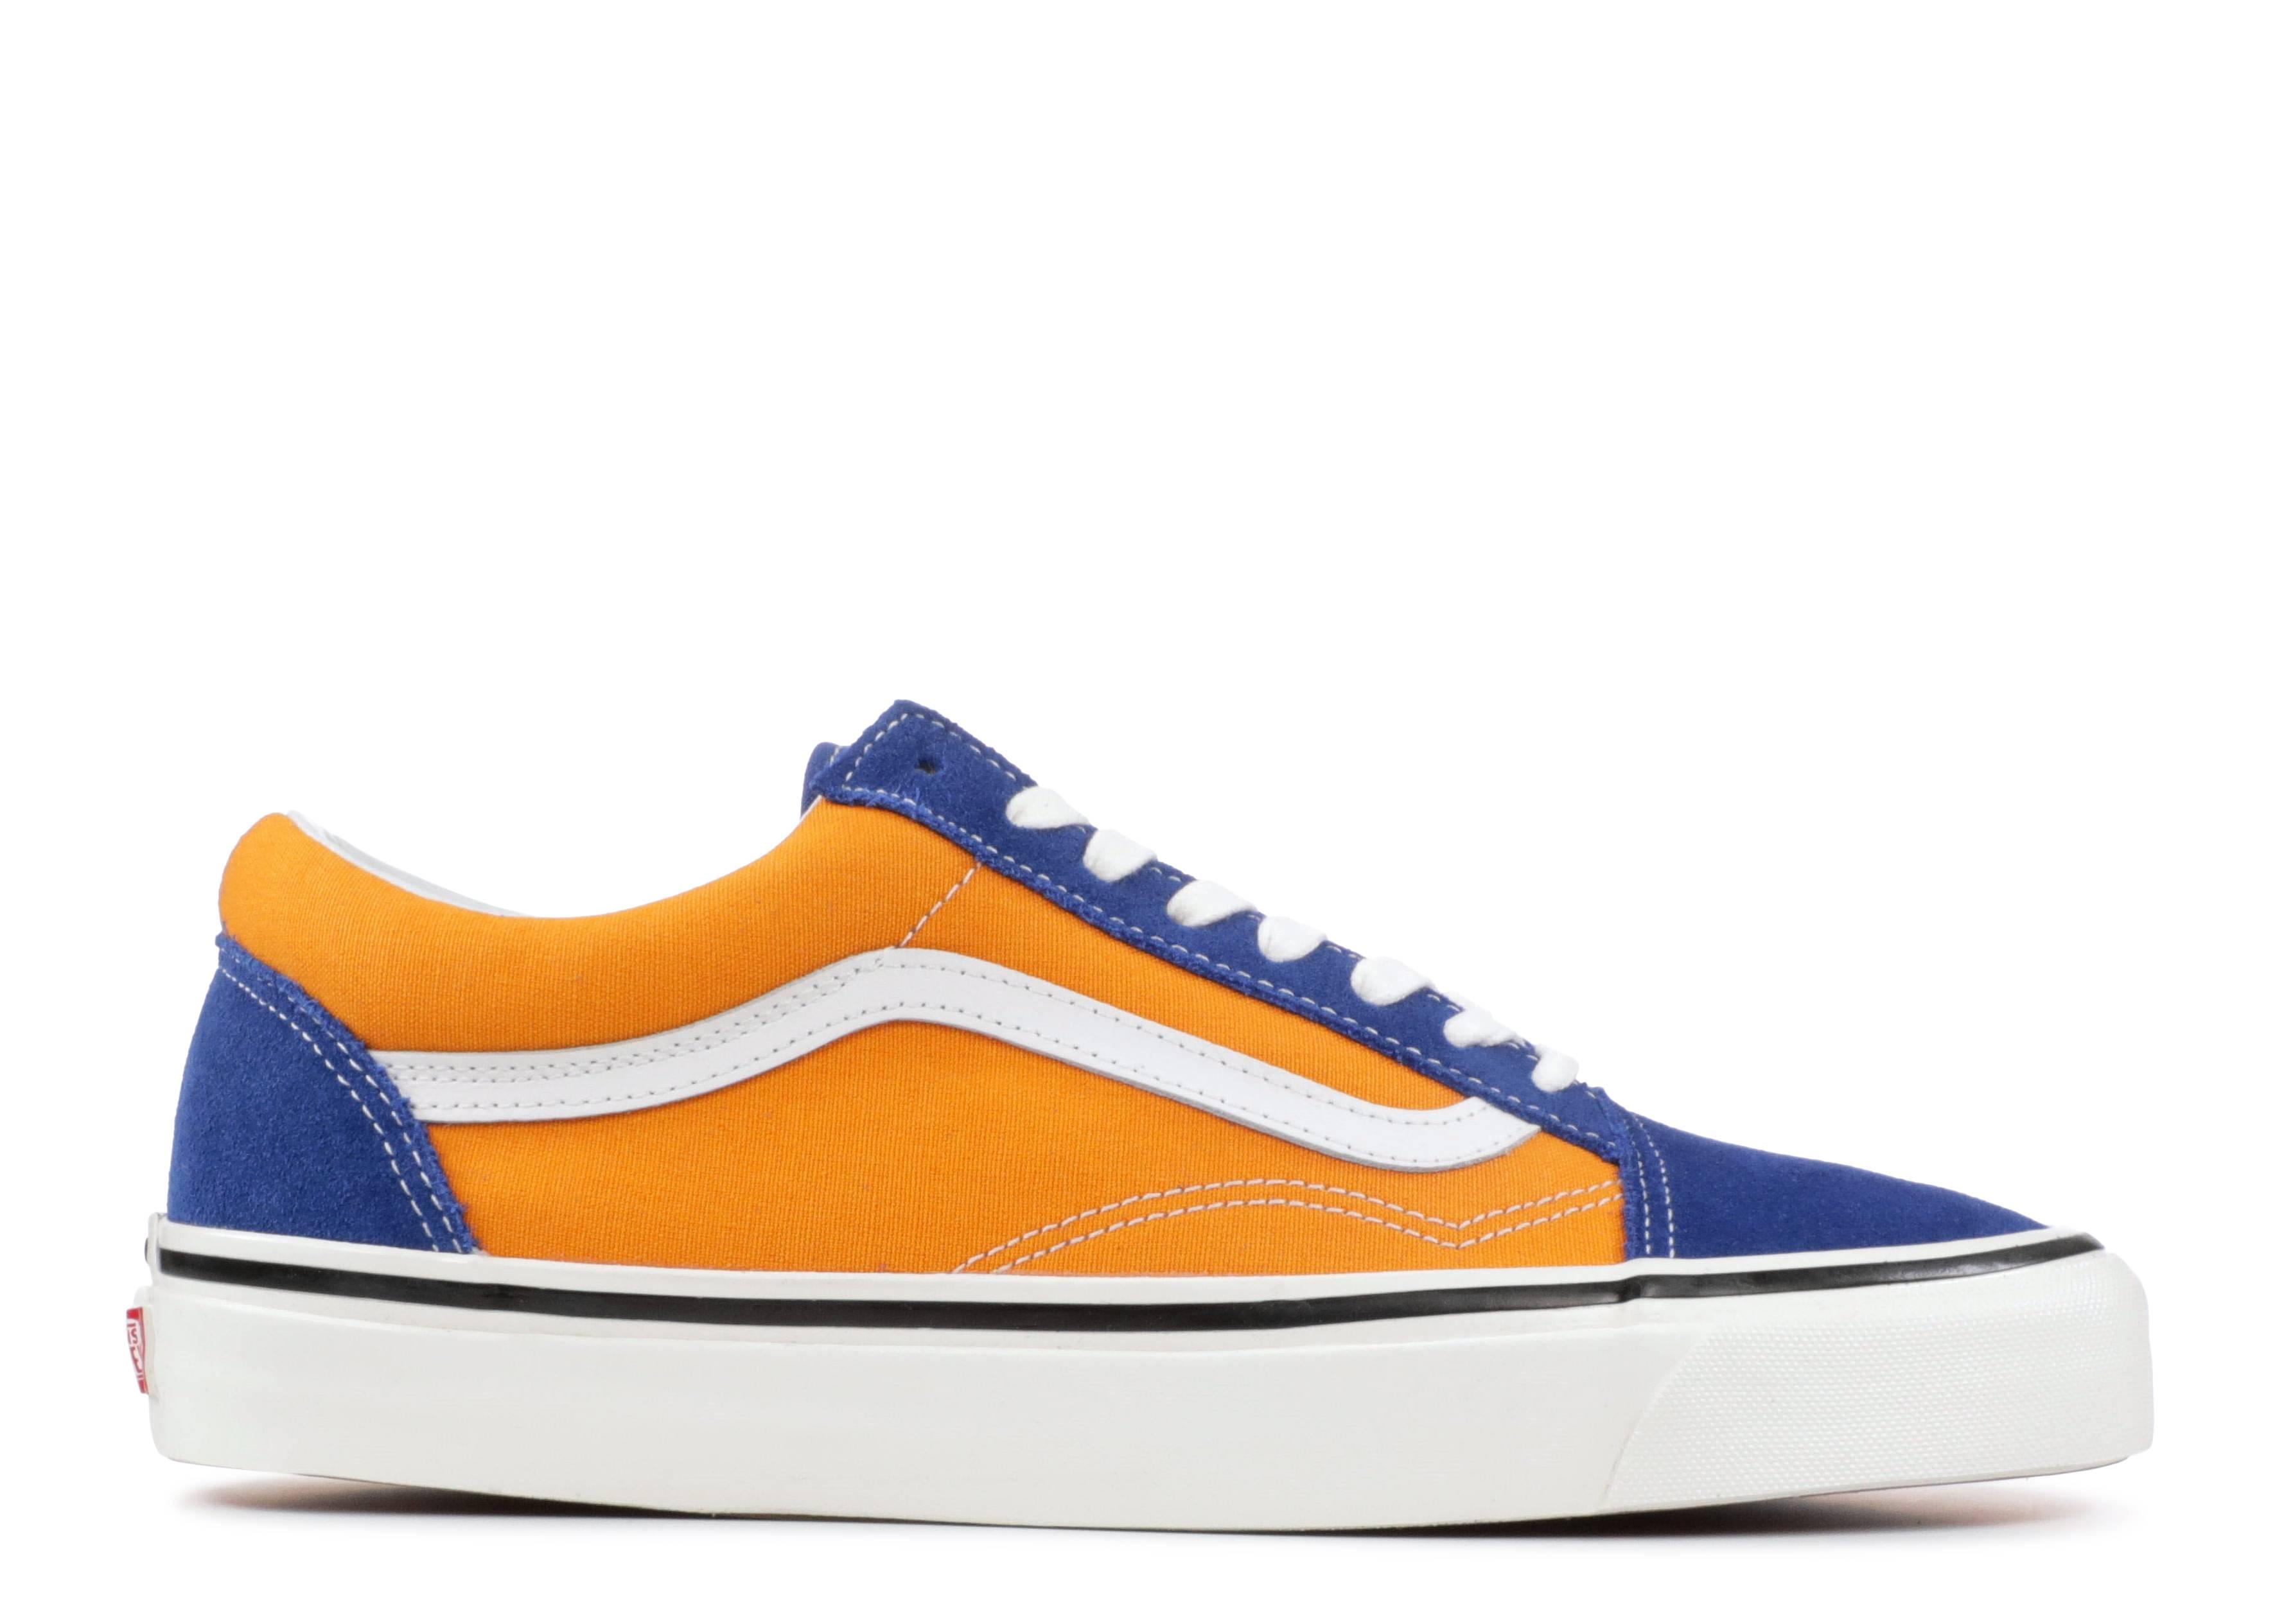 346fd9b21f9 Old Skool 36 DX - Vans - VN0A38G2R1V - og blue og gold